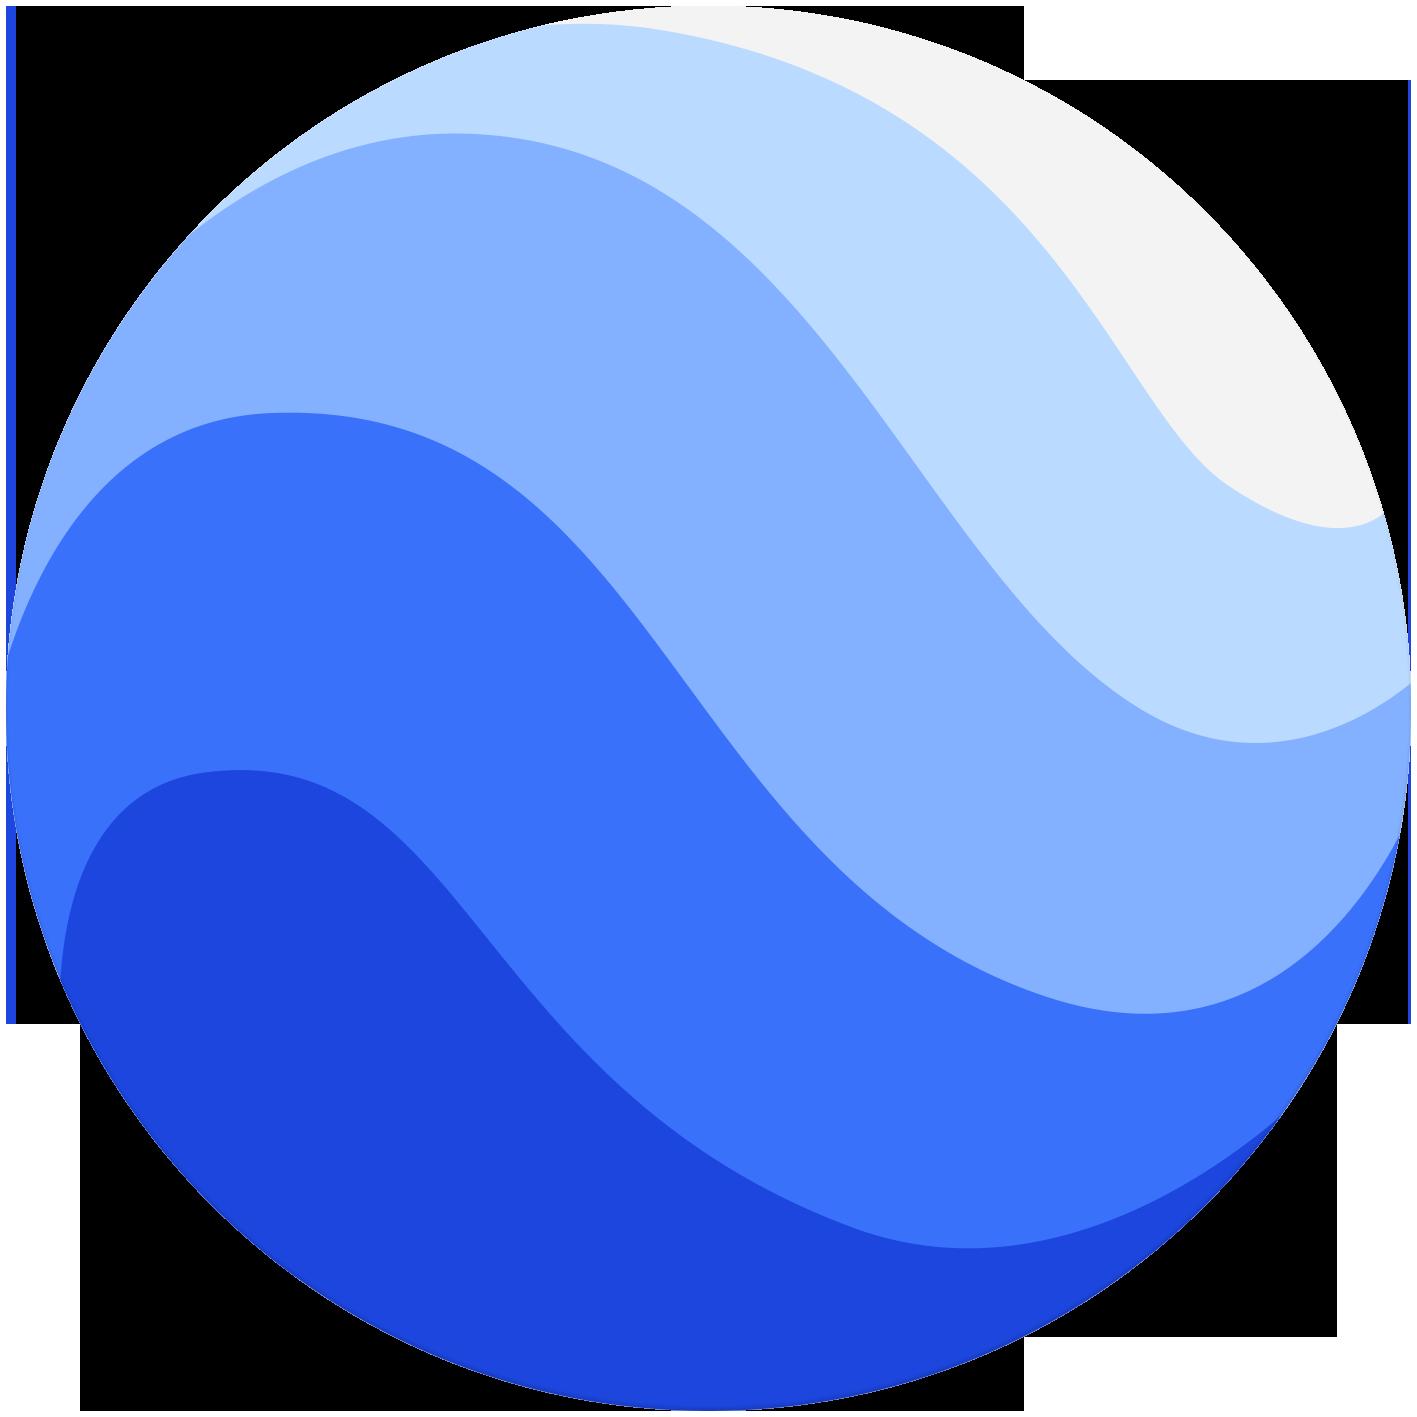 Clipart world google earth. Image png logopedia fandom